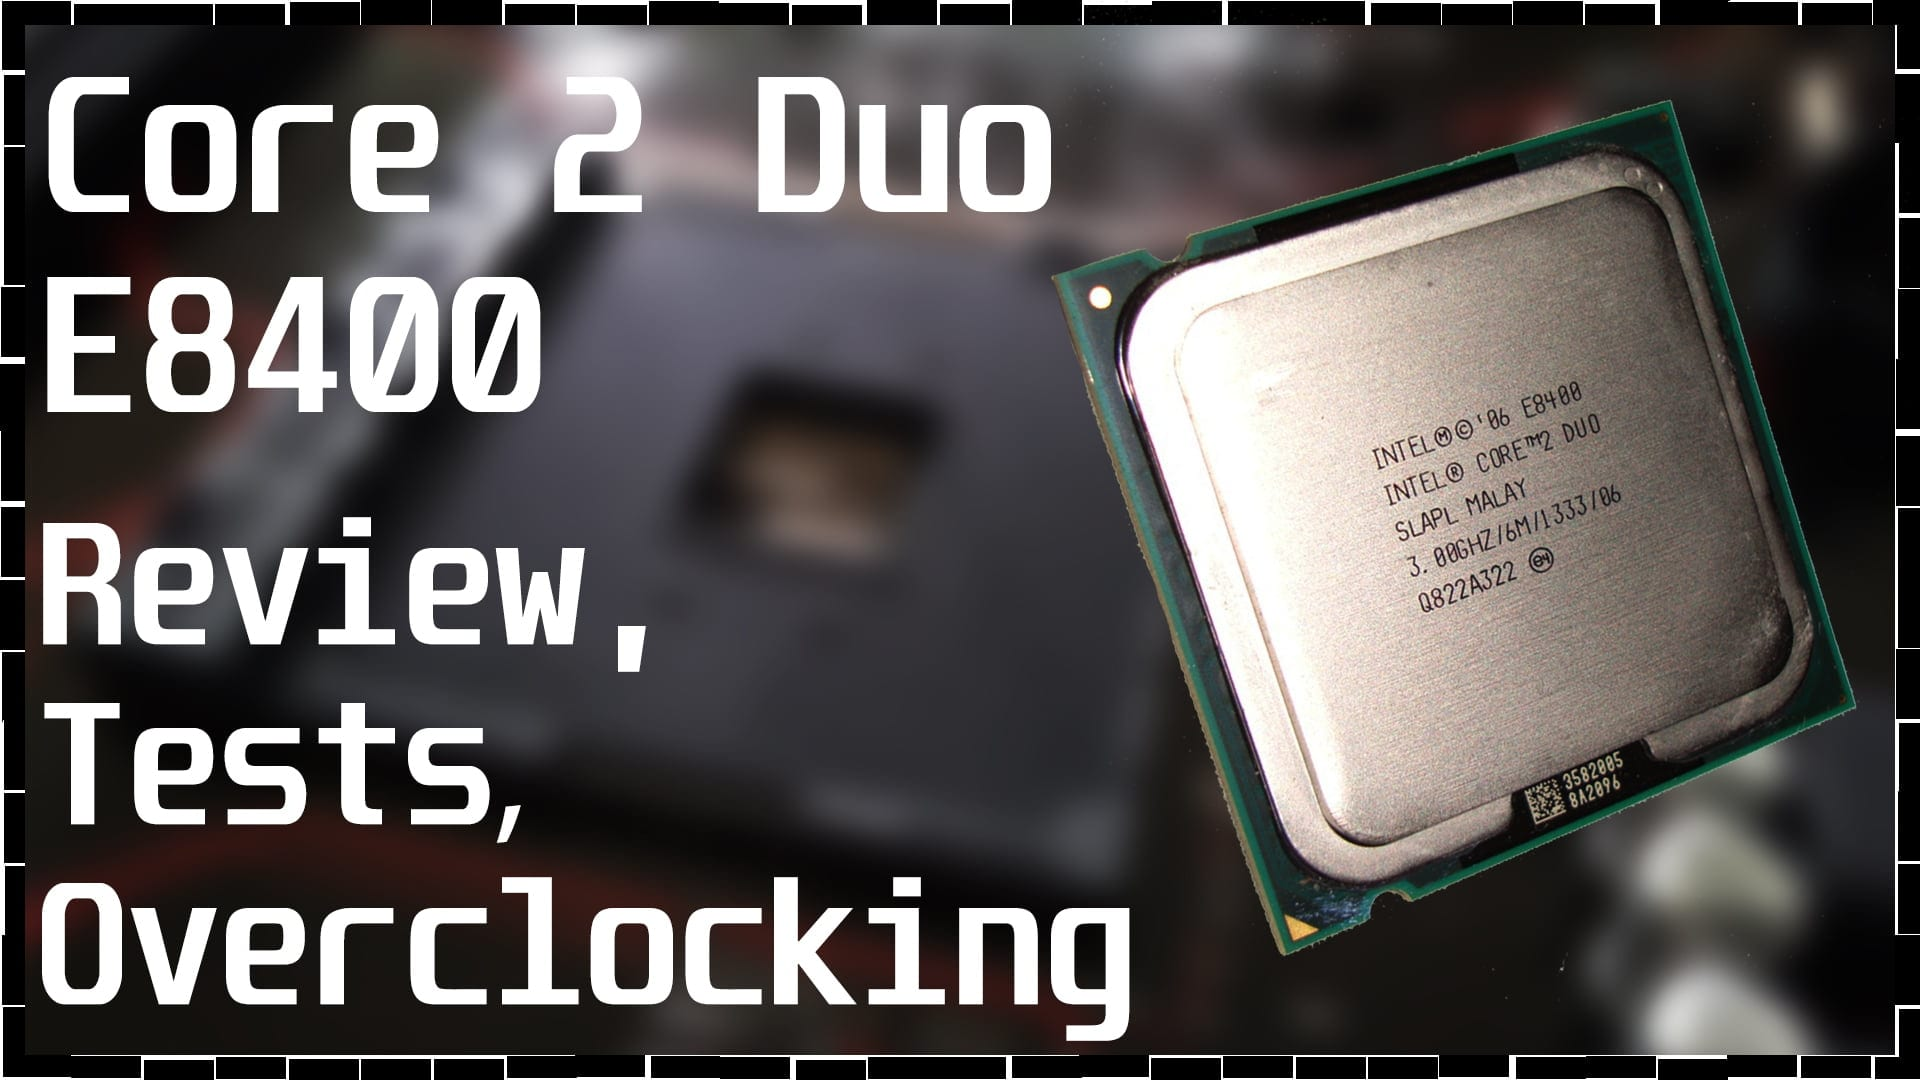 Wolfdale в 2012 году: Разгон и тесты Intel Core 2 Duo E8400, E6300 и Phenom II X2 545